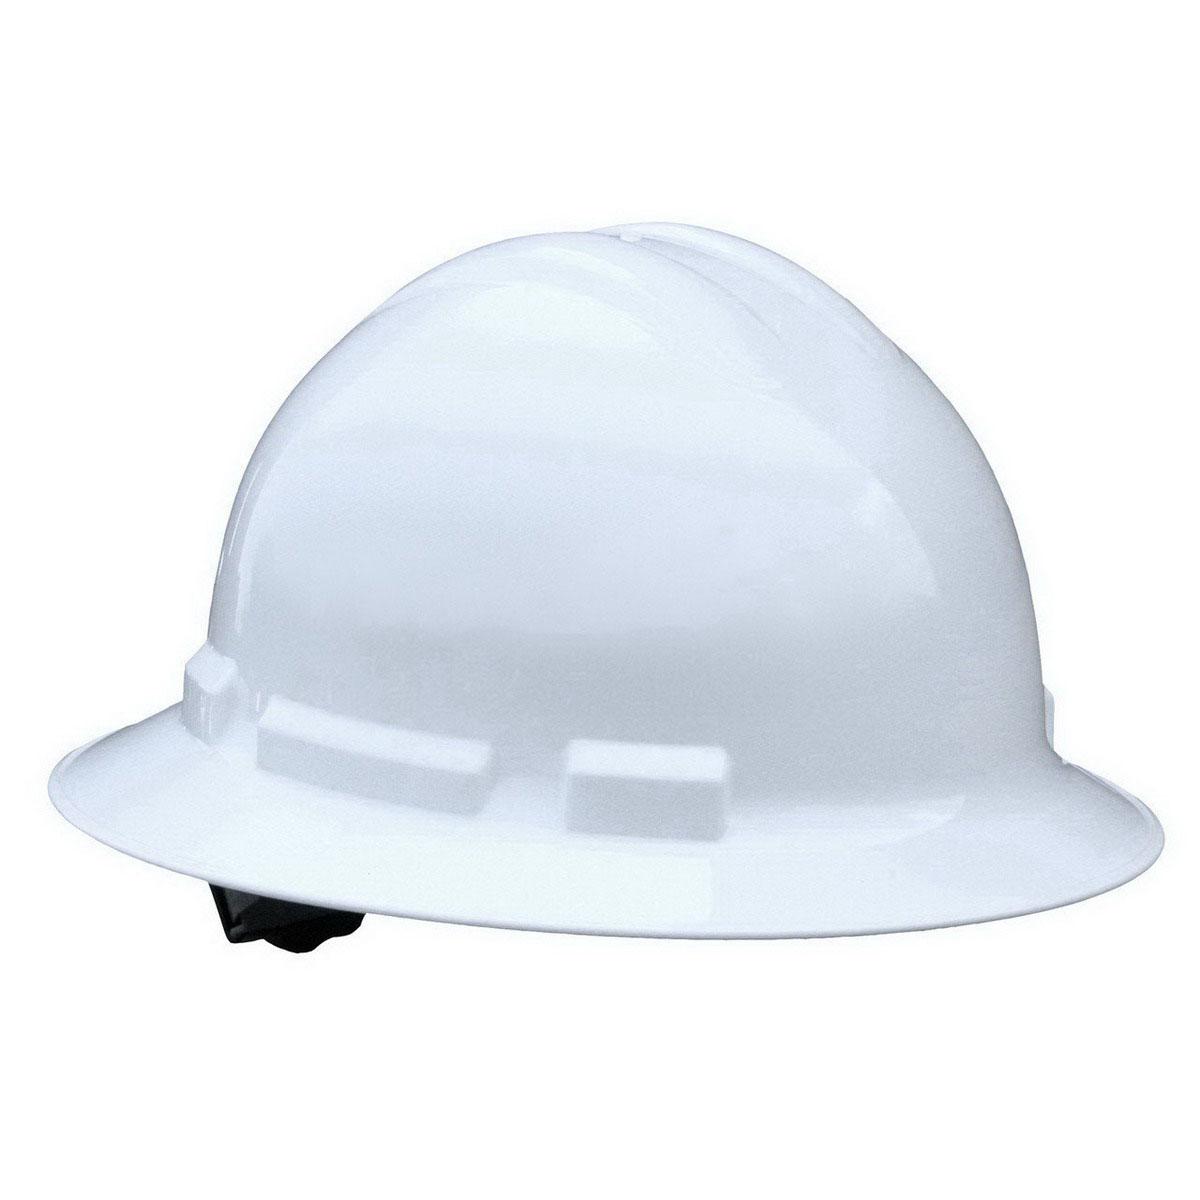 Radians® QHR4-White Full Brim Hard Hat - 4-Point Ratchet Suspension